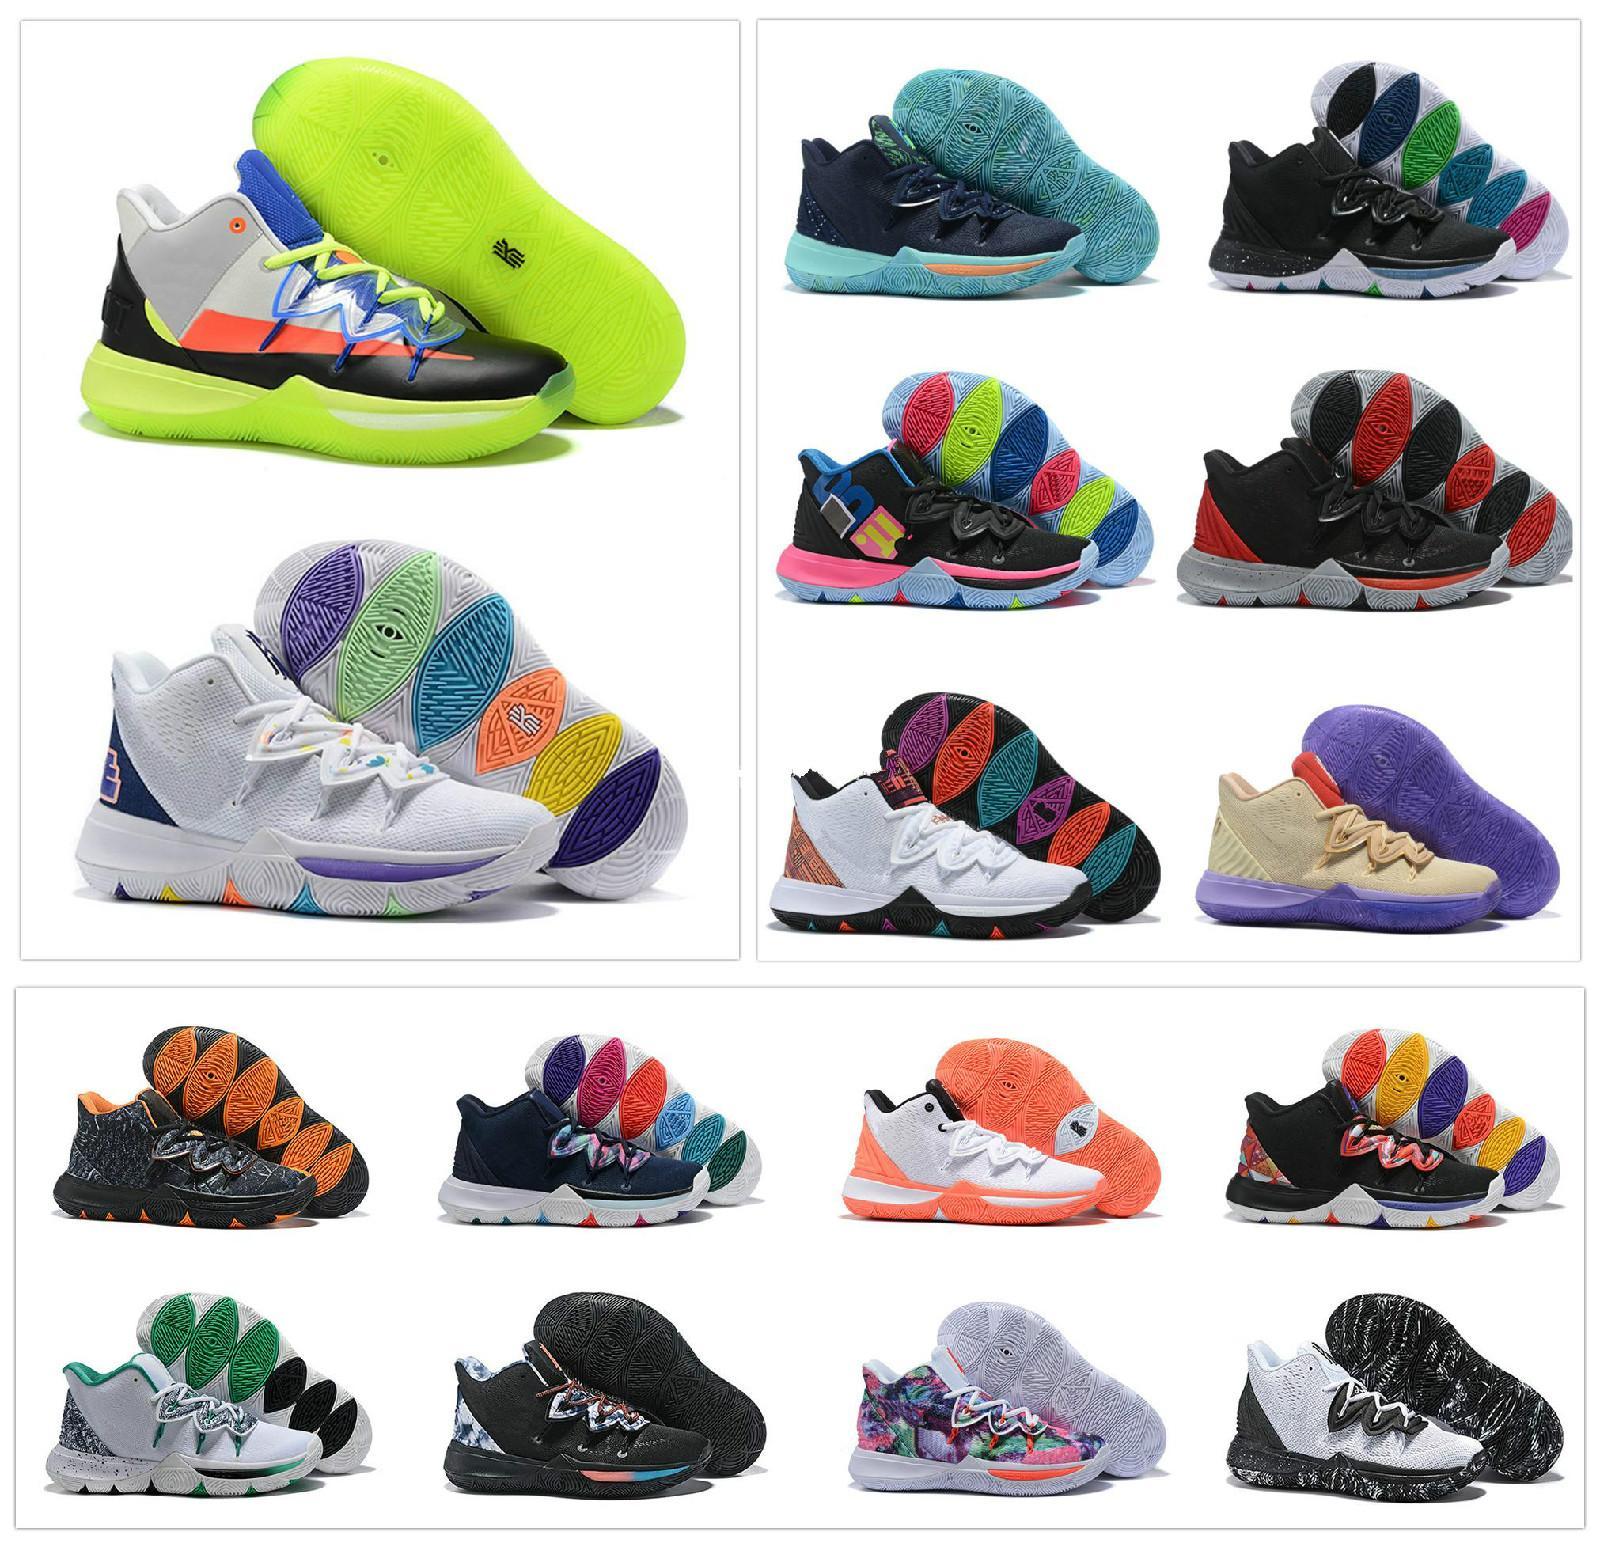 Hot Boys Kids Kyrie V 5 All-Star-Basketball-Schuhe Irving 5S Männer Jugend-Mädchen-Frauen Zoom Sport Training Turnschuhe Hohe Knöchel Größe 36-46